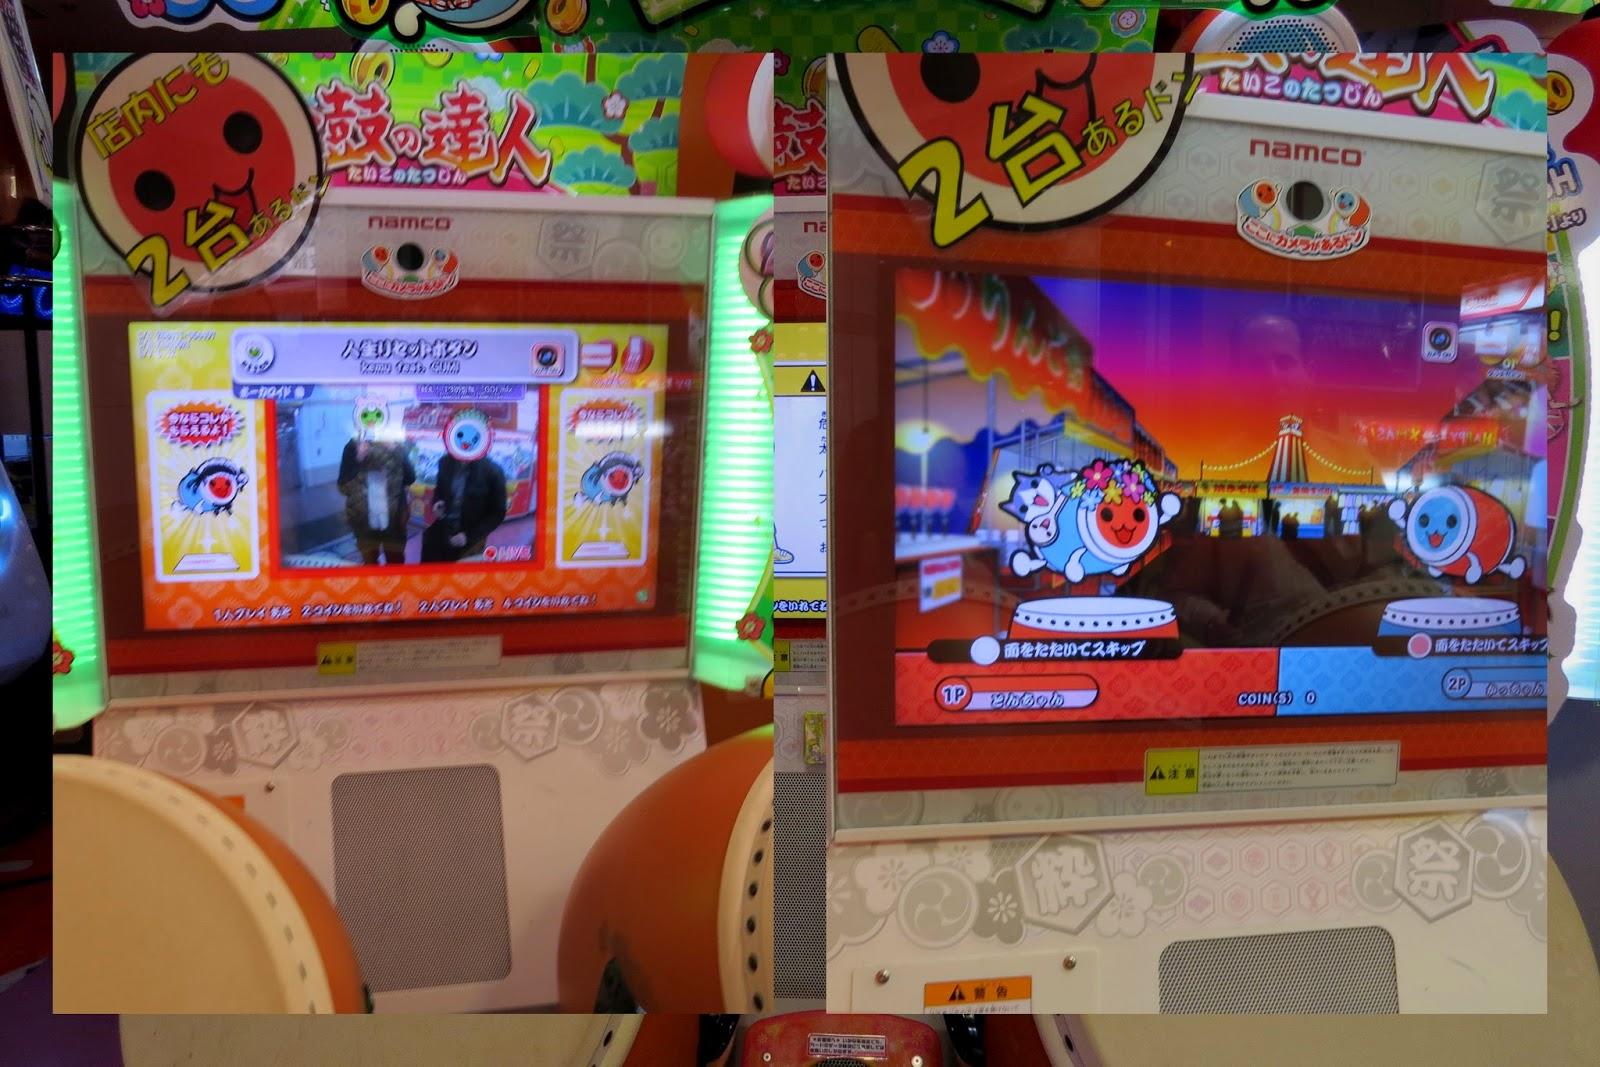 Taiko Drum Video Game - Tokyo